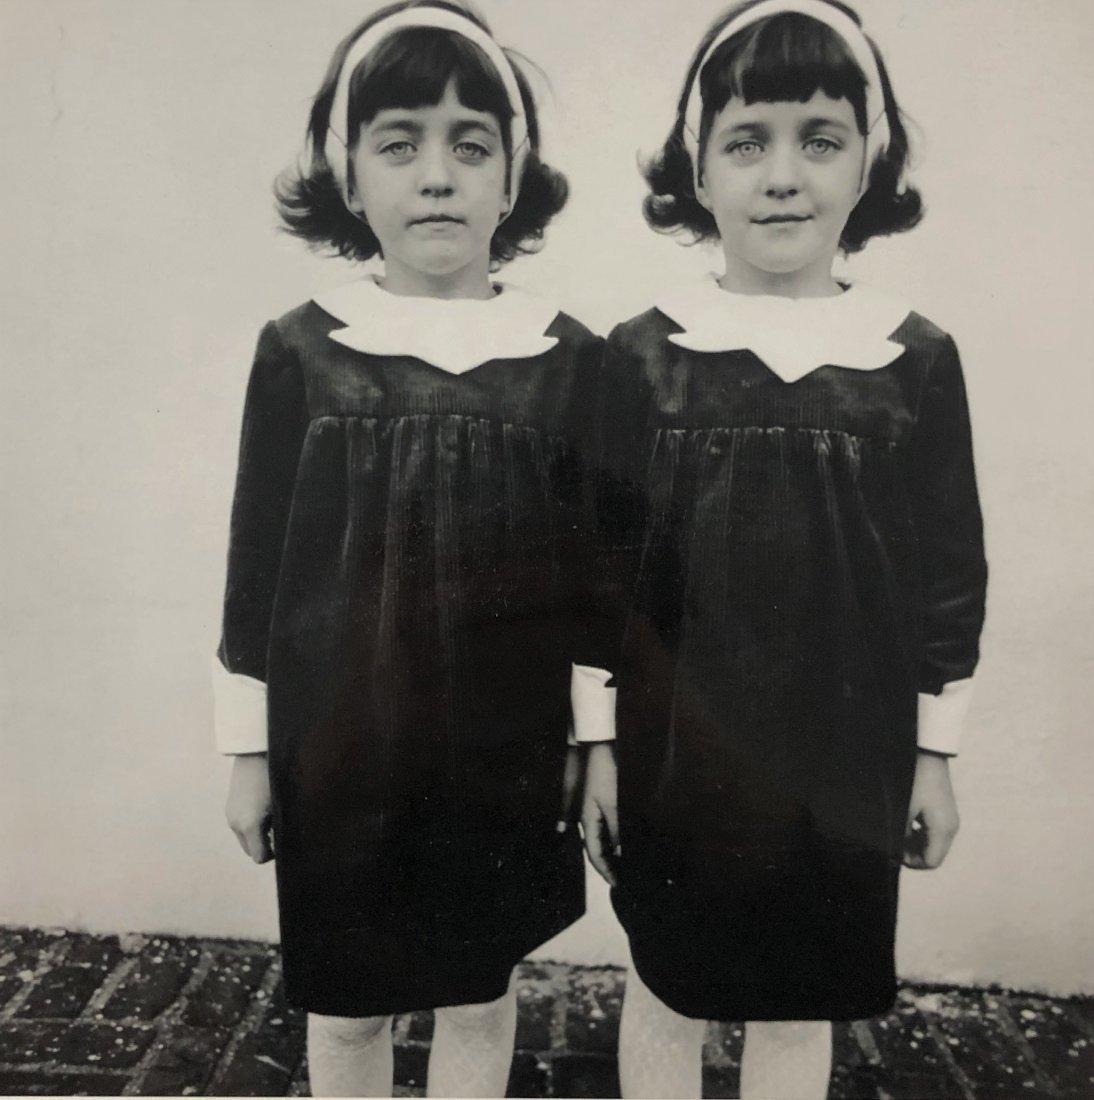 Diane Arbus - Identical Twins, Roselle, Silver Gelatin